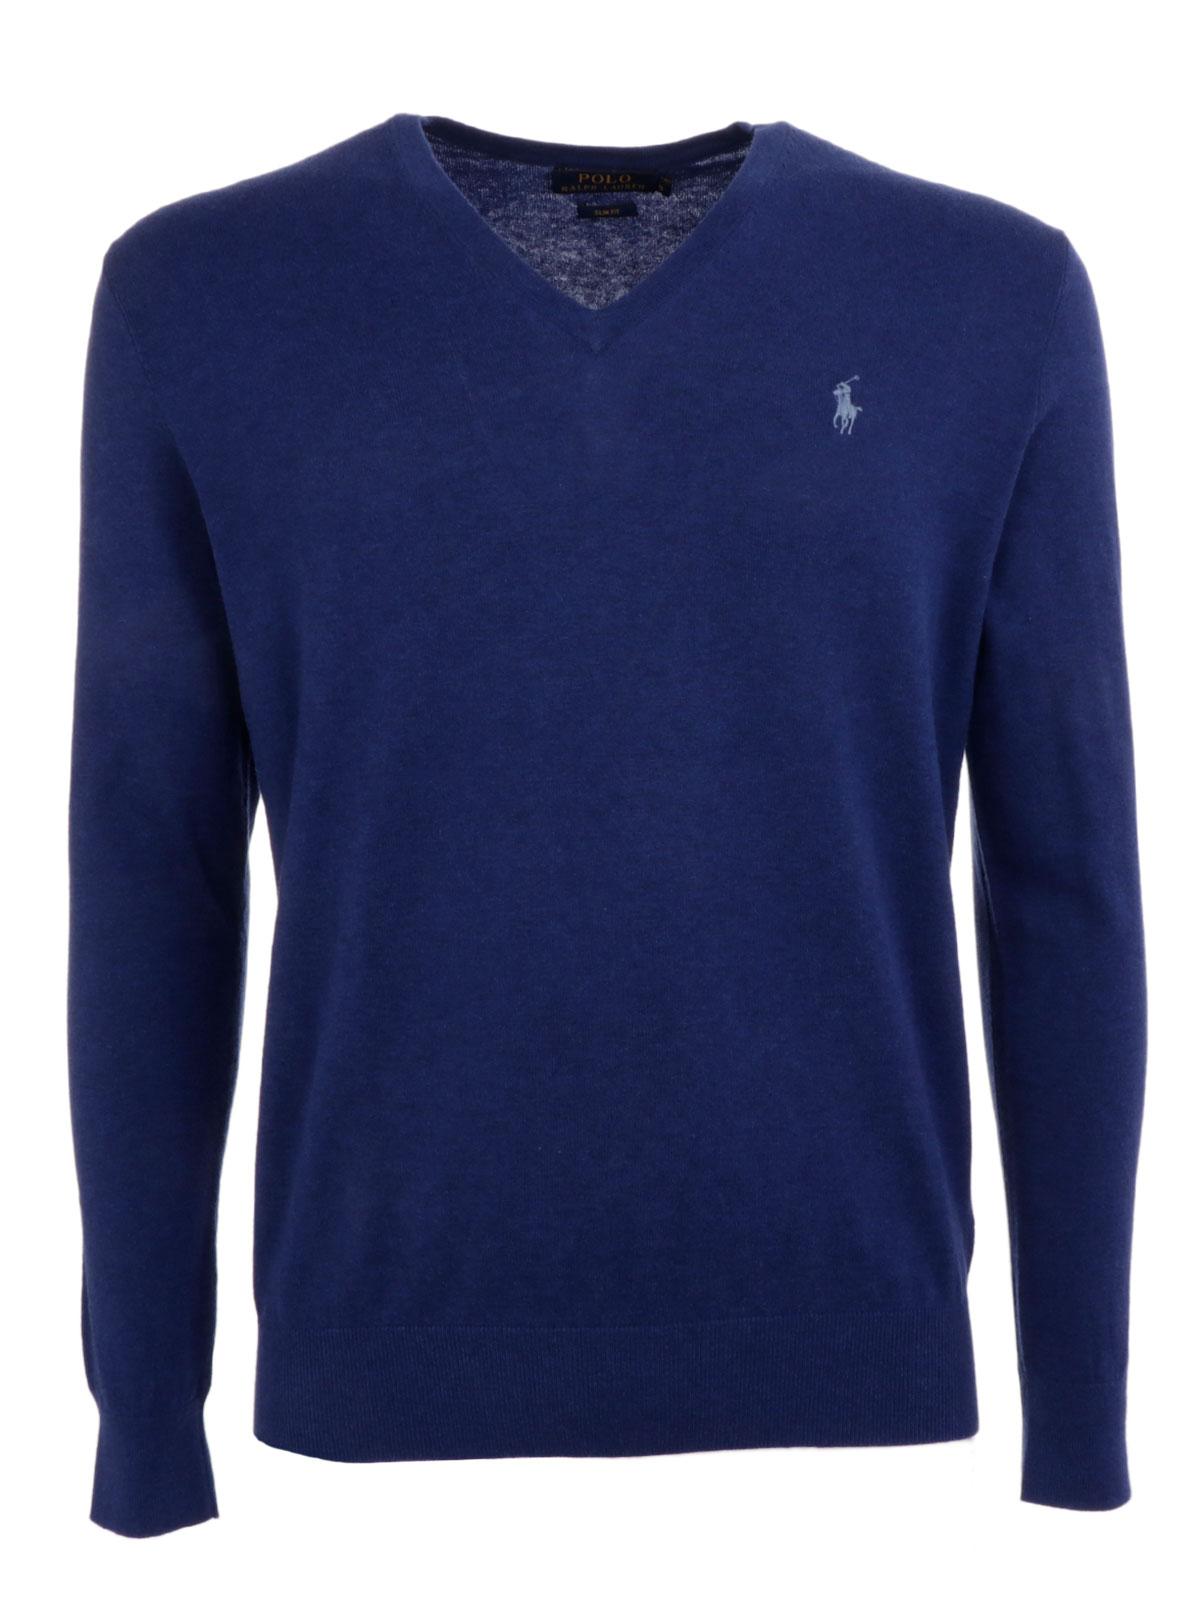 Picture of POLO RALPH LAUREN   Men's Cotton Blend Sweater